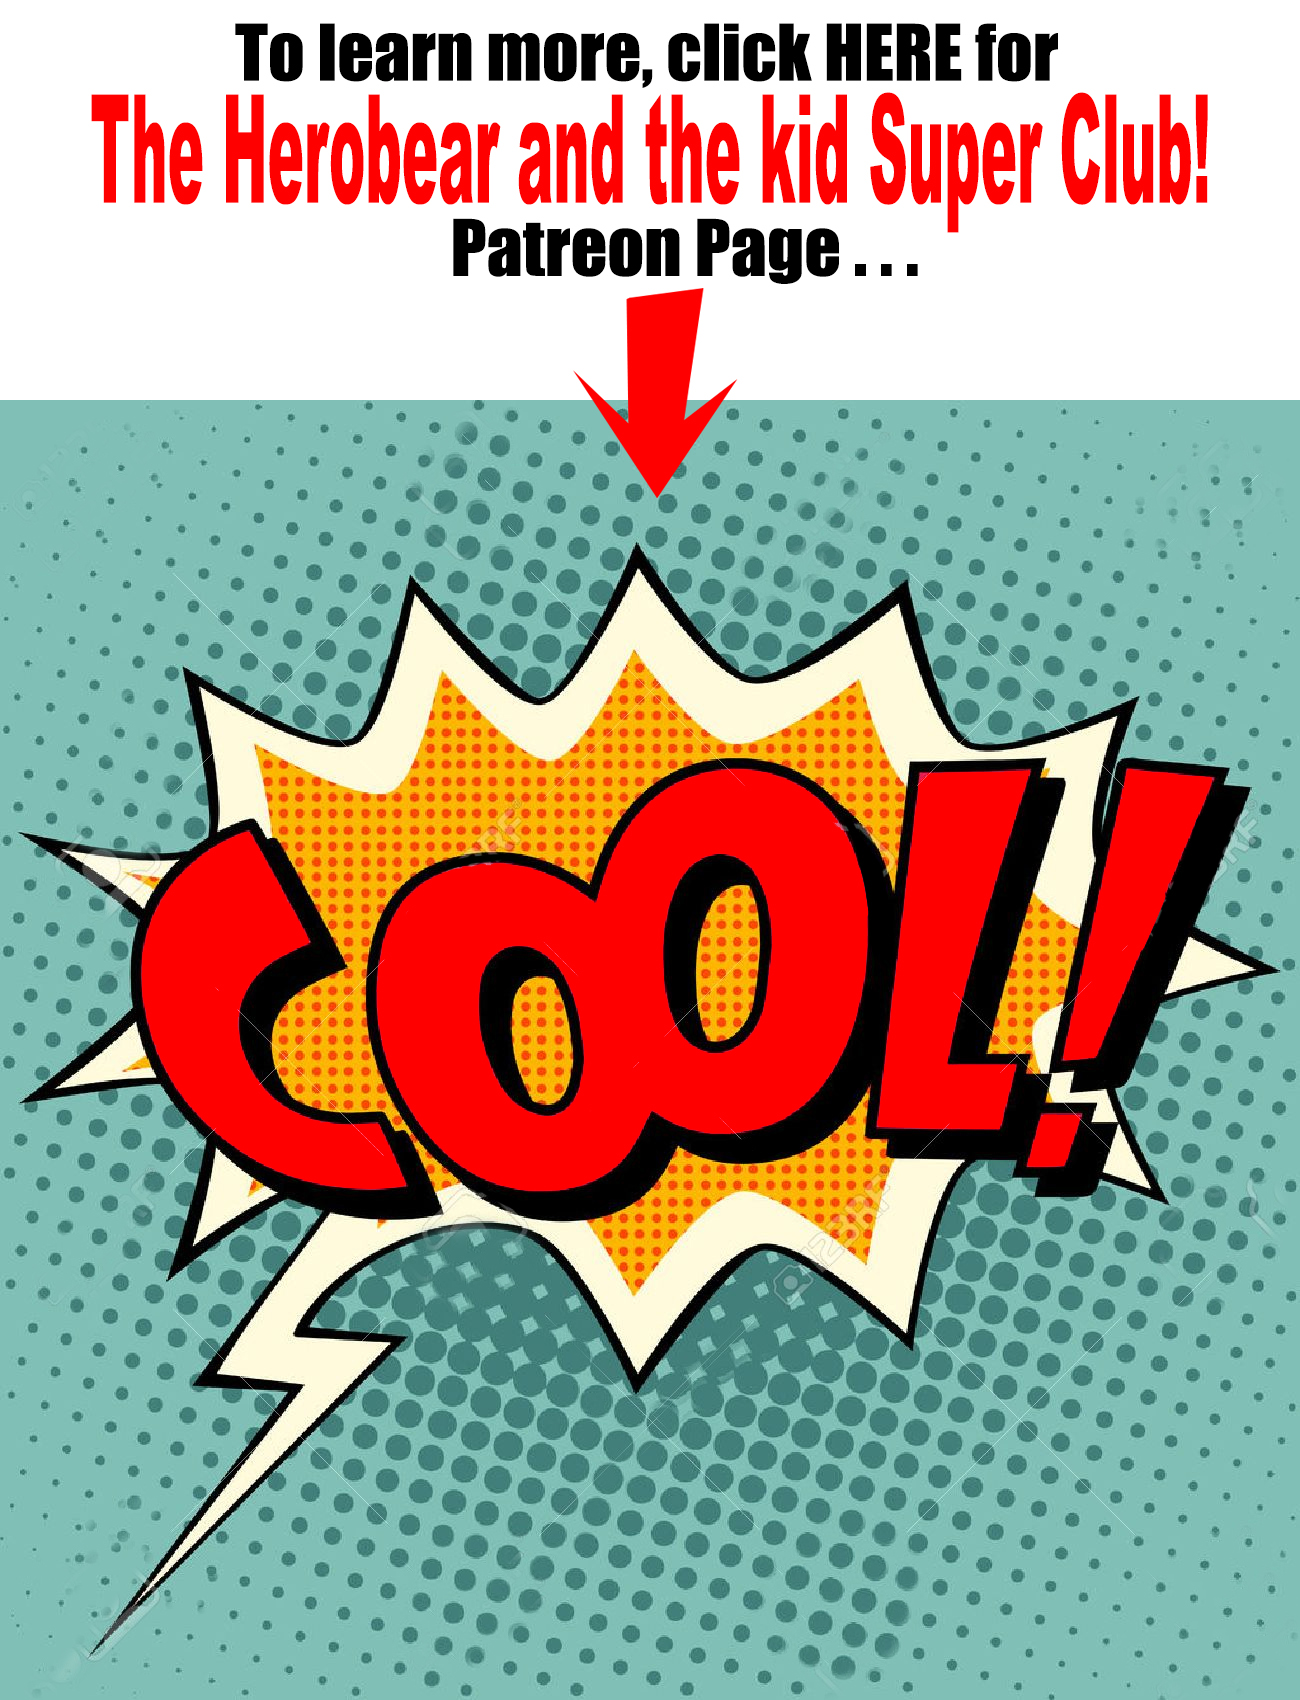 patreon-coollinkclick.jpg